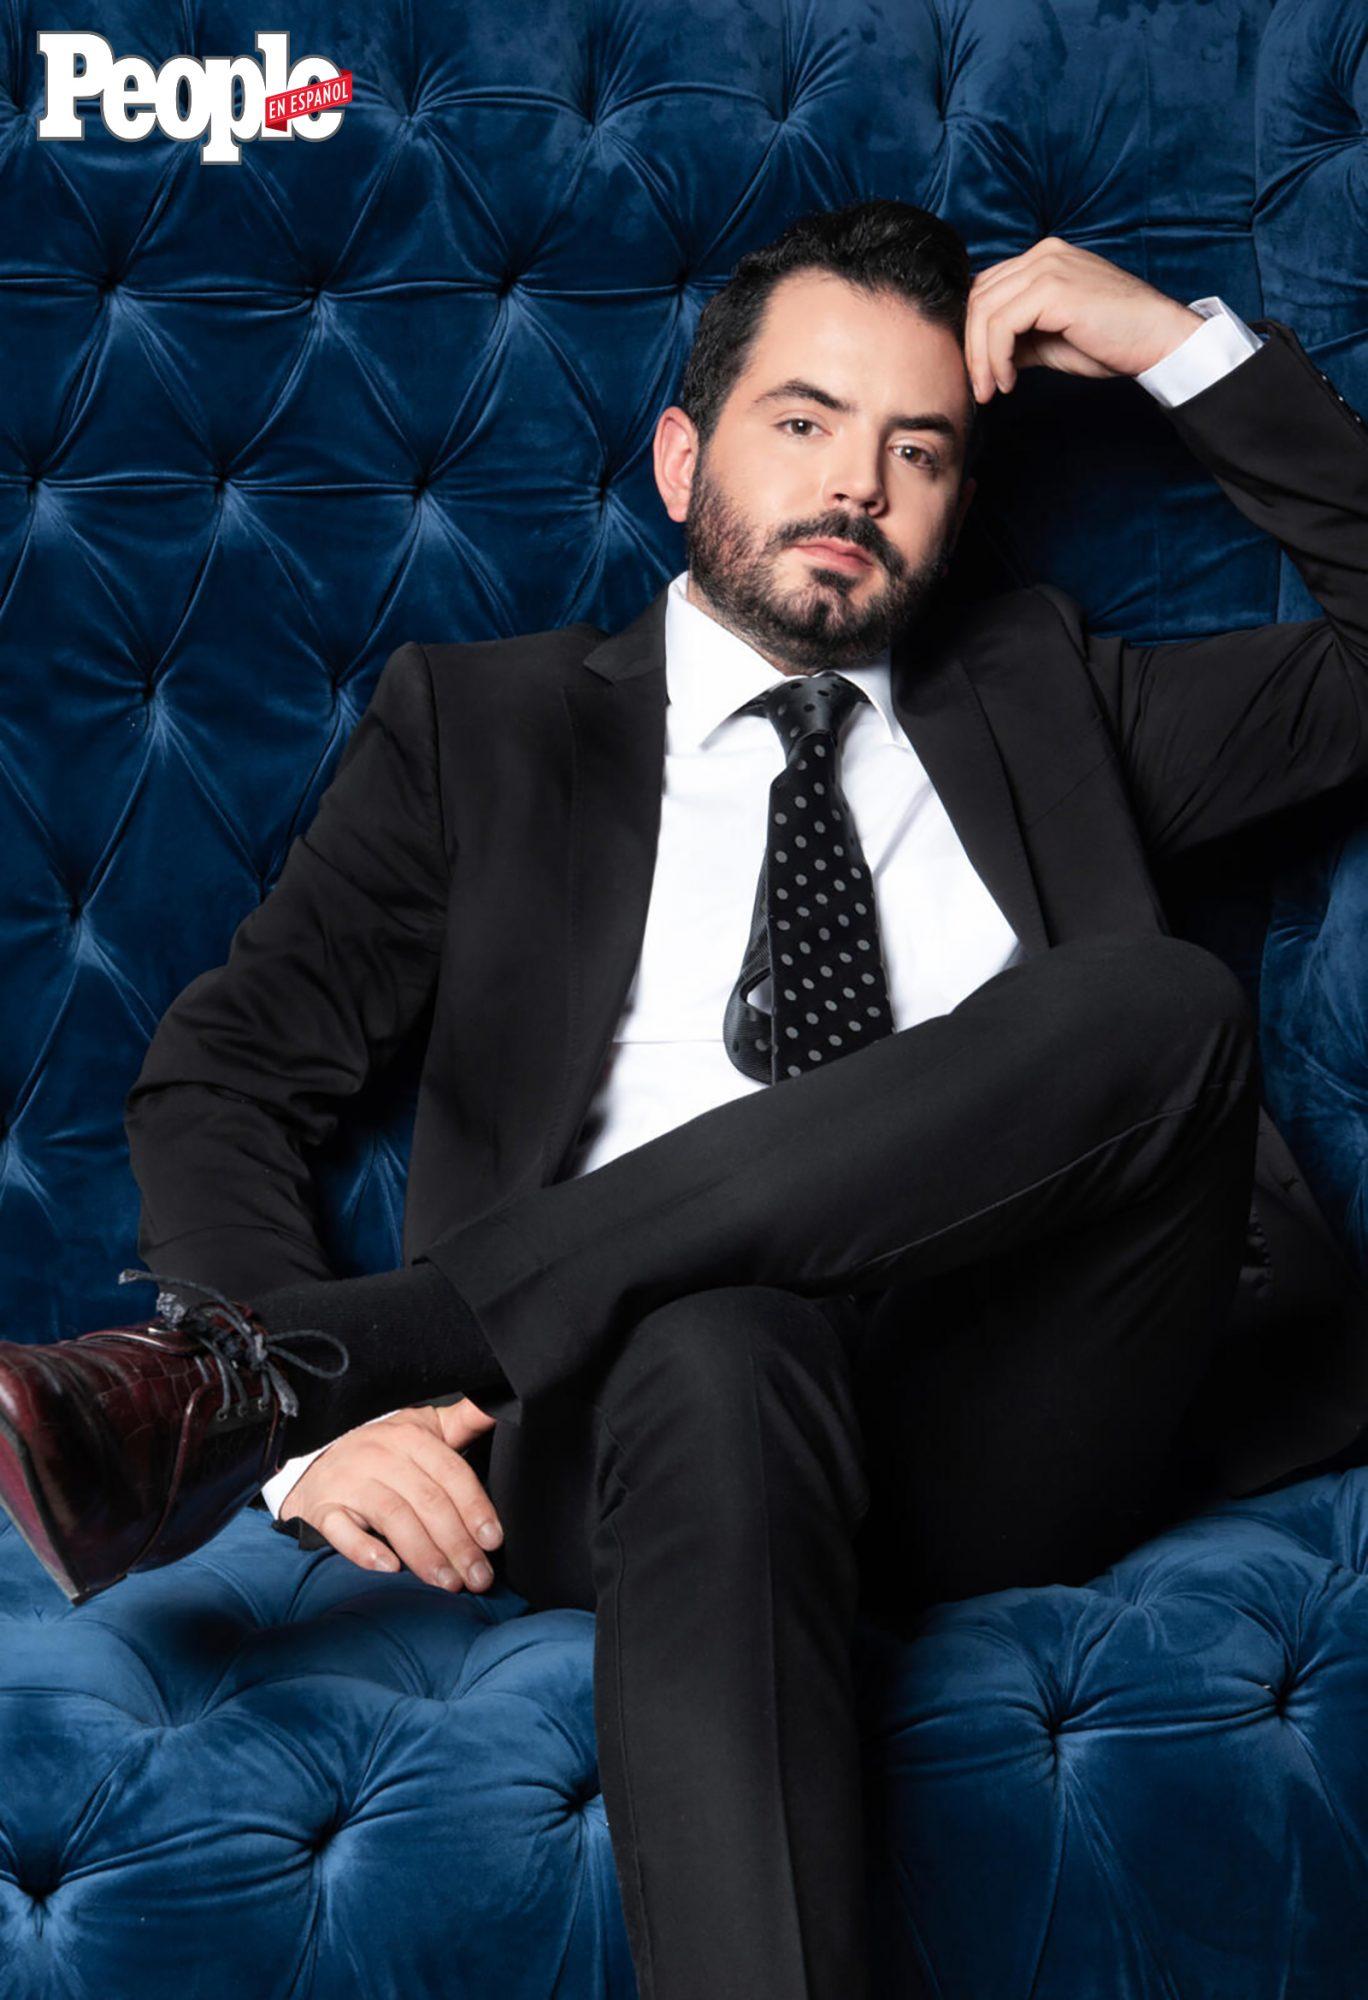 José Eduardo Derbez - Bellos - DO NOT REUSE